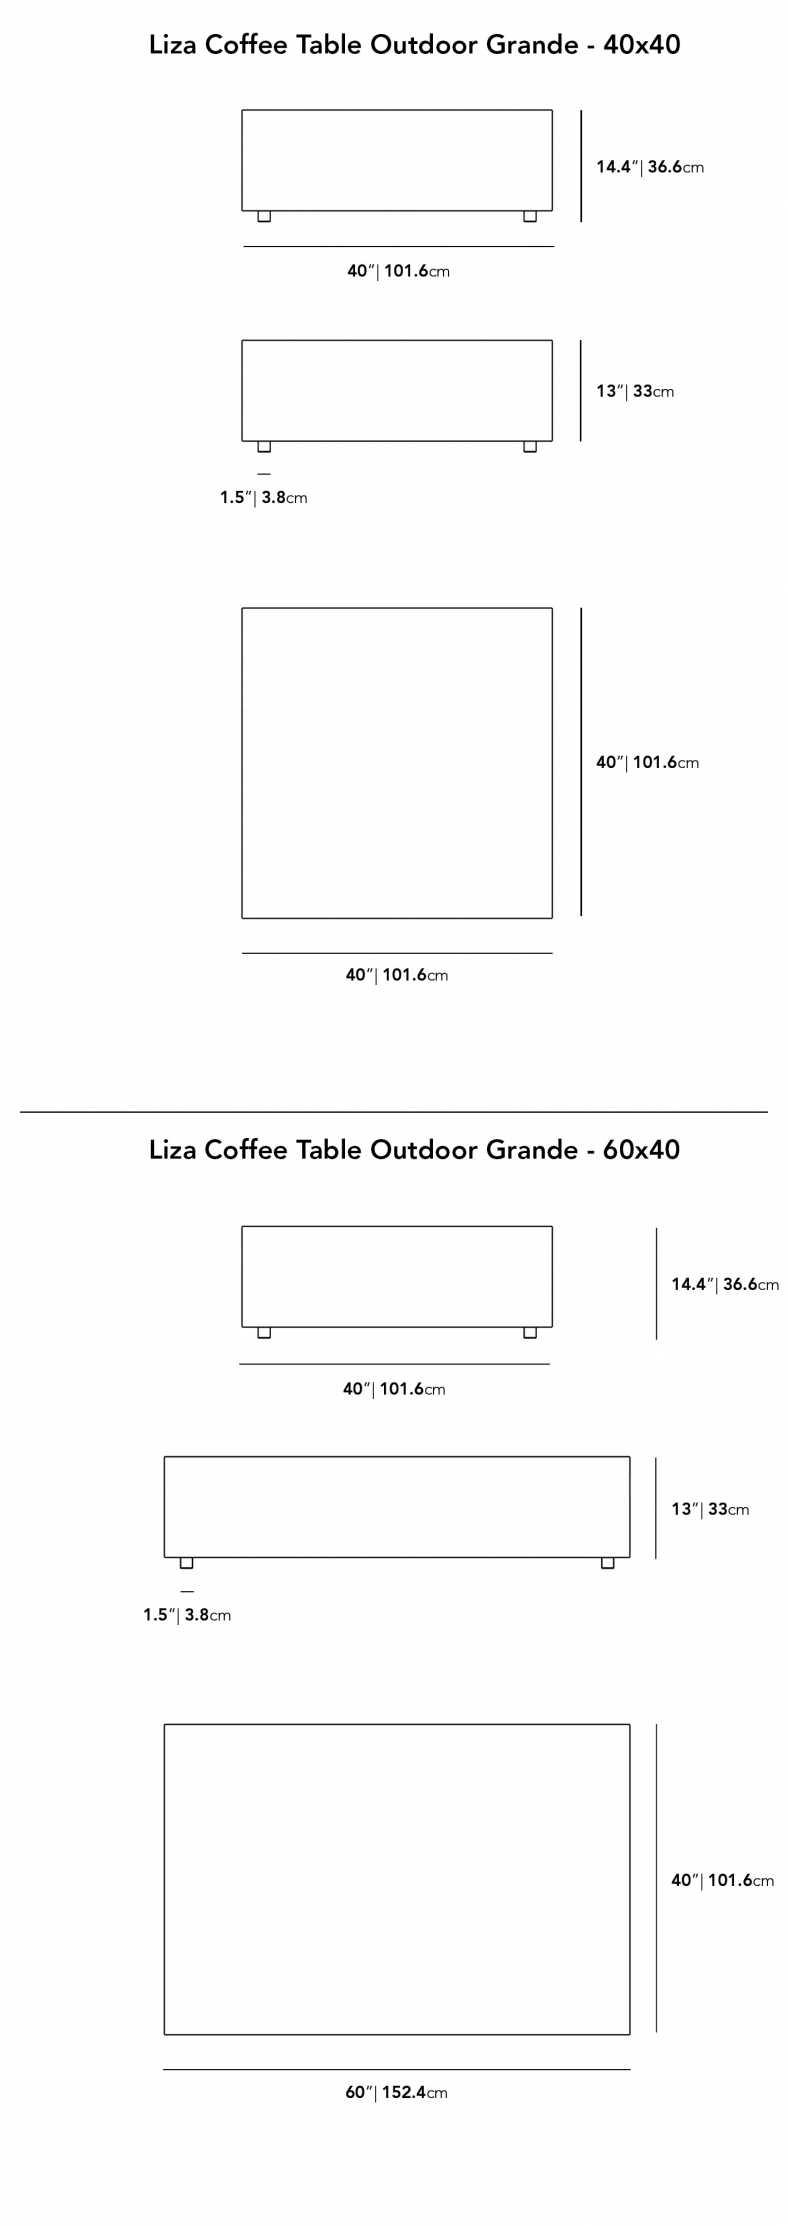 Dimensions for Liza Outdoor Coffee Table Grande